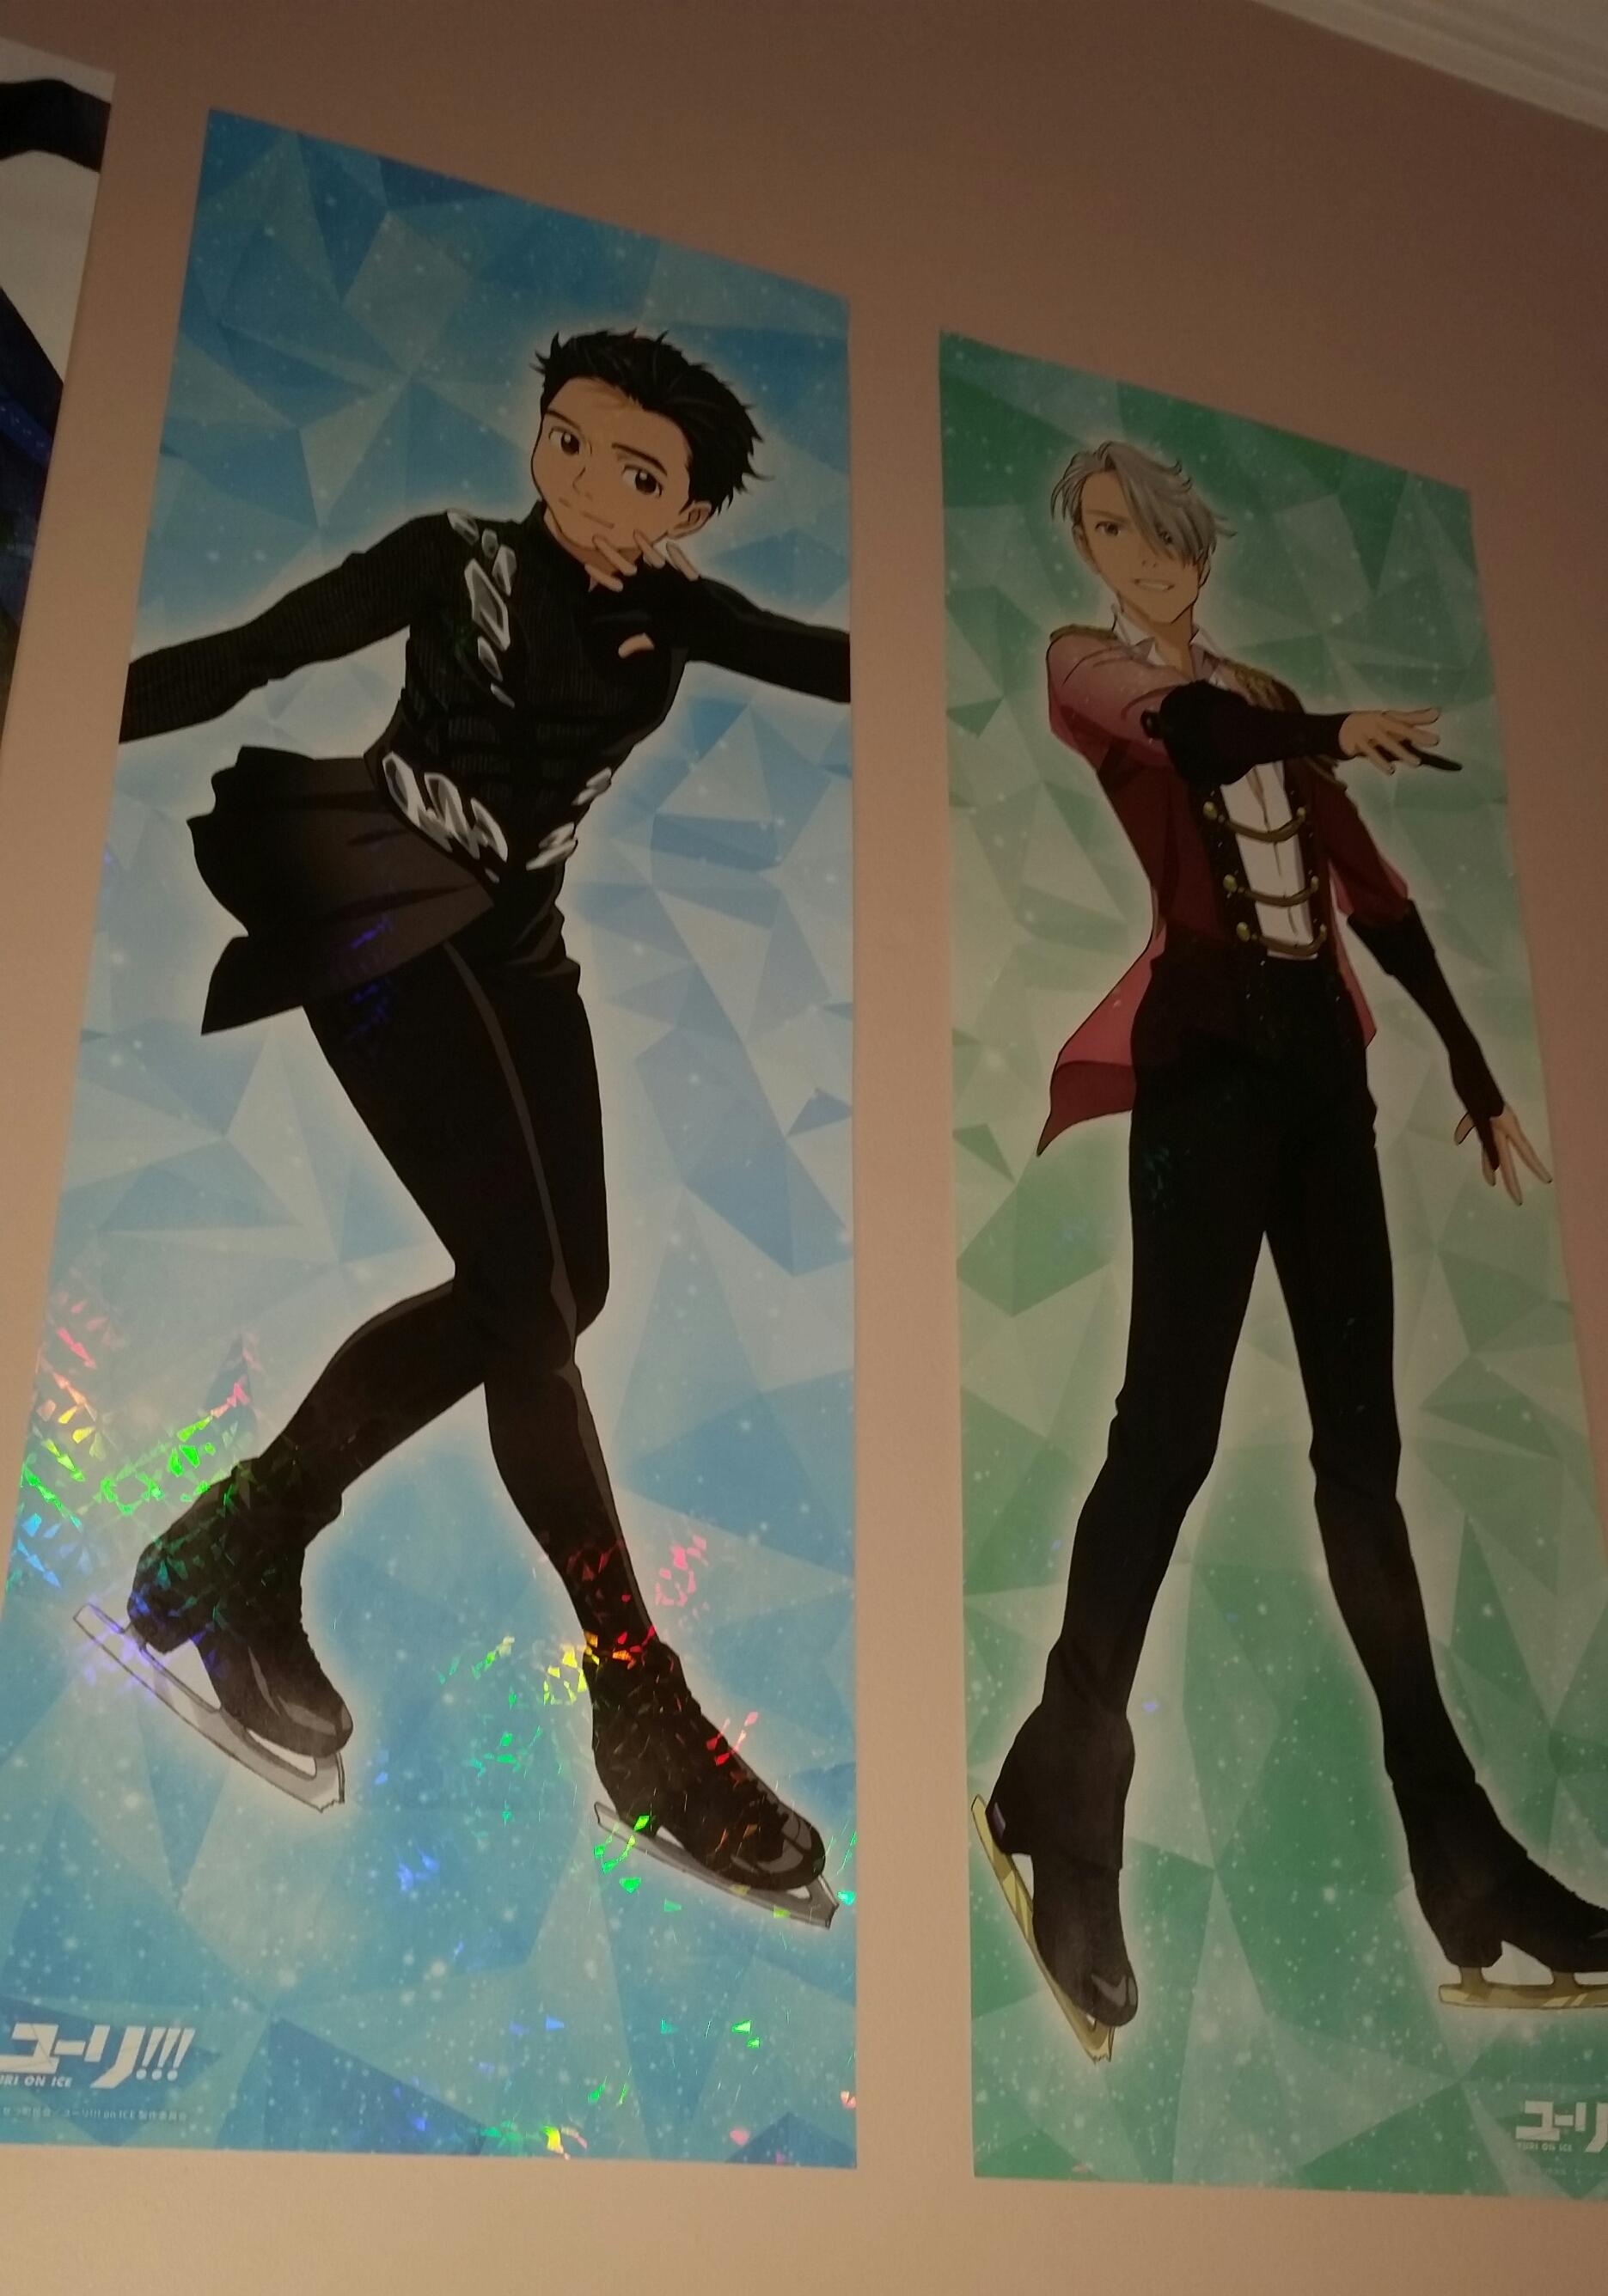 poster kadokawa long_poster mappa yuri!!!_on_ice katsuki_yuuri victor_nikiforov yuri!!!_on_ice_long_poster_collection